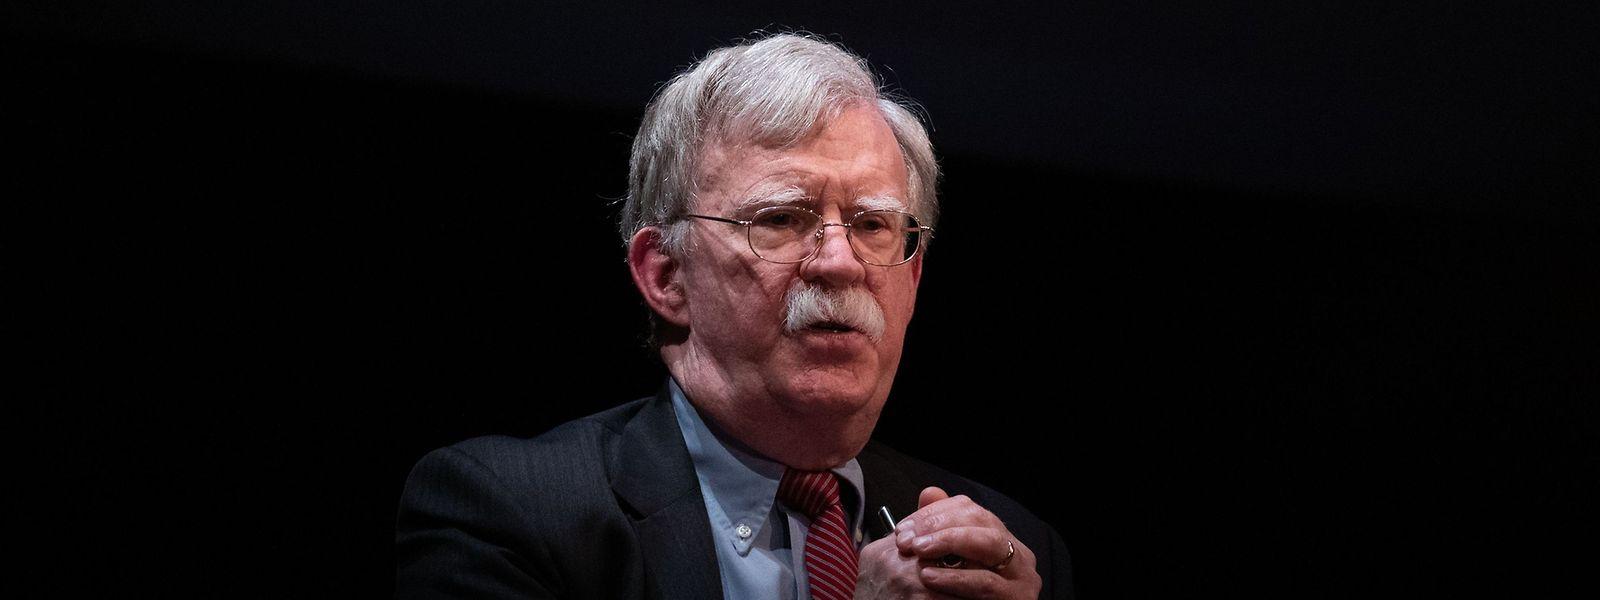 Der frühere Nationale Sicherheitsberater John Bolton plaudert aus dem Nähkästchen.